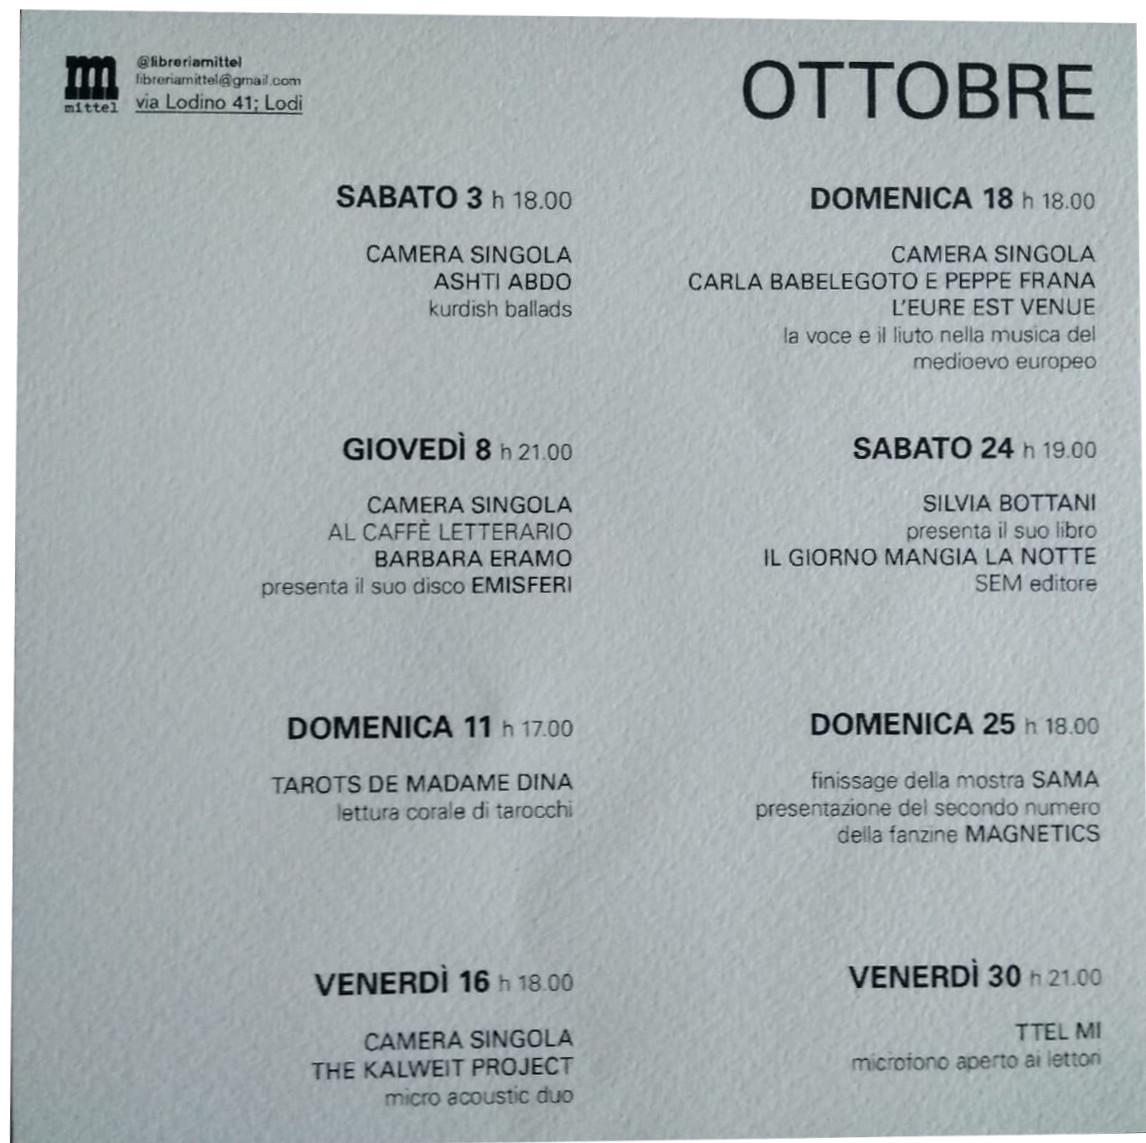 Mittel Ottobre 2020 edizionindipendenti